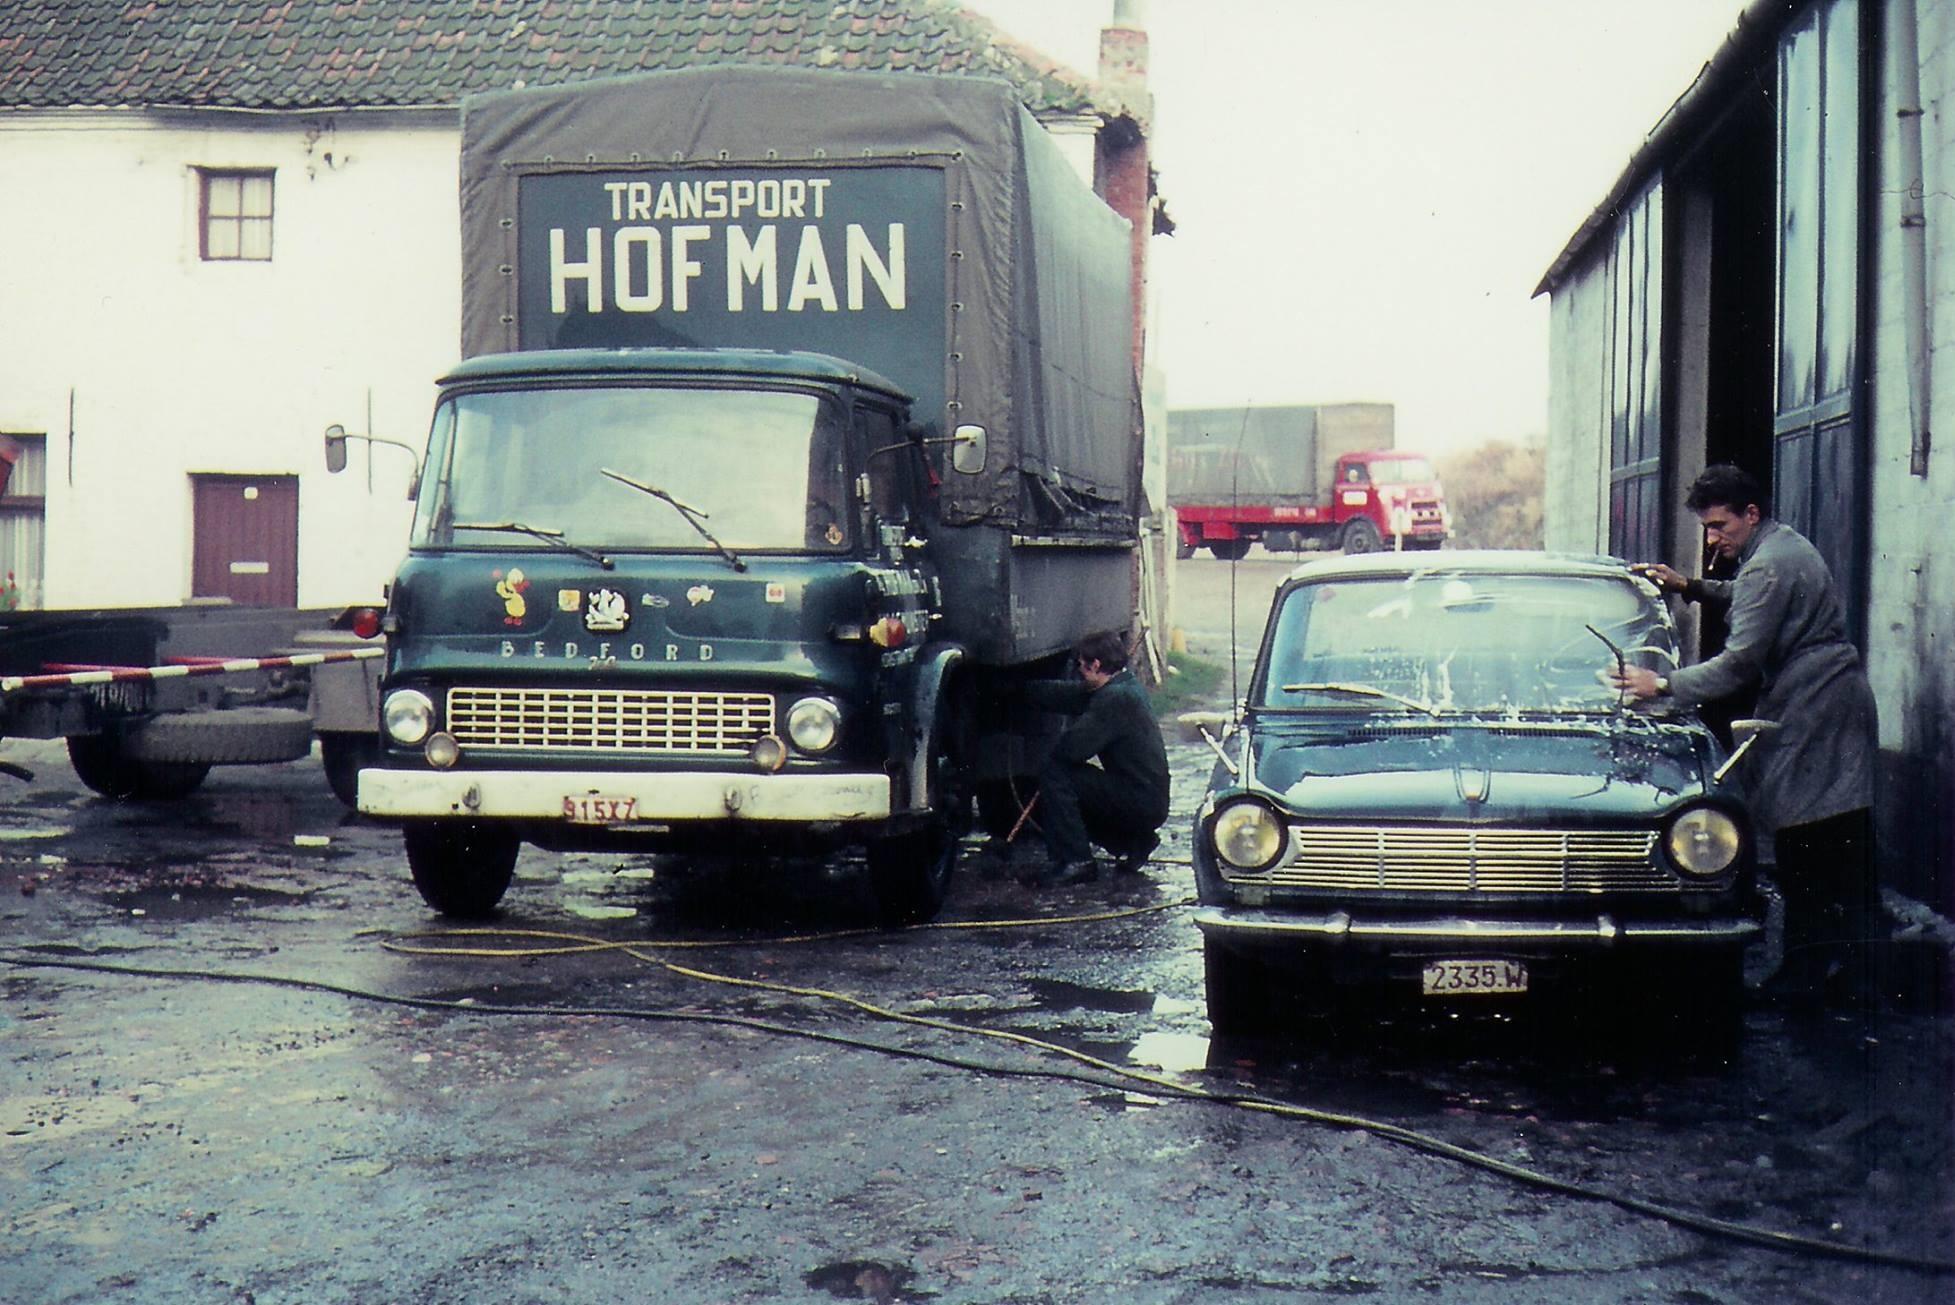 Bedford-1970-Nonkel-Andre-wast-de-simca-1000-archief-Johan-Hofman